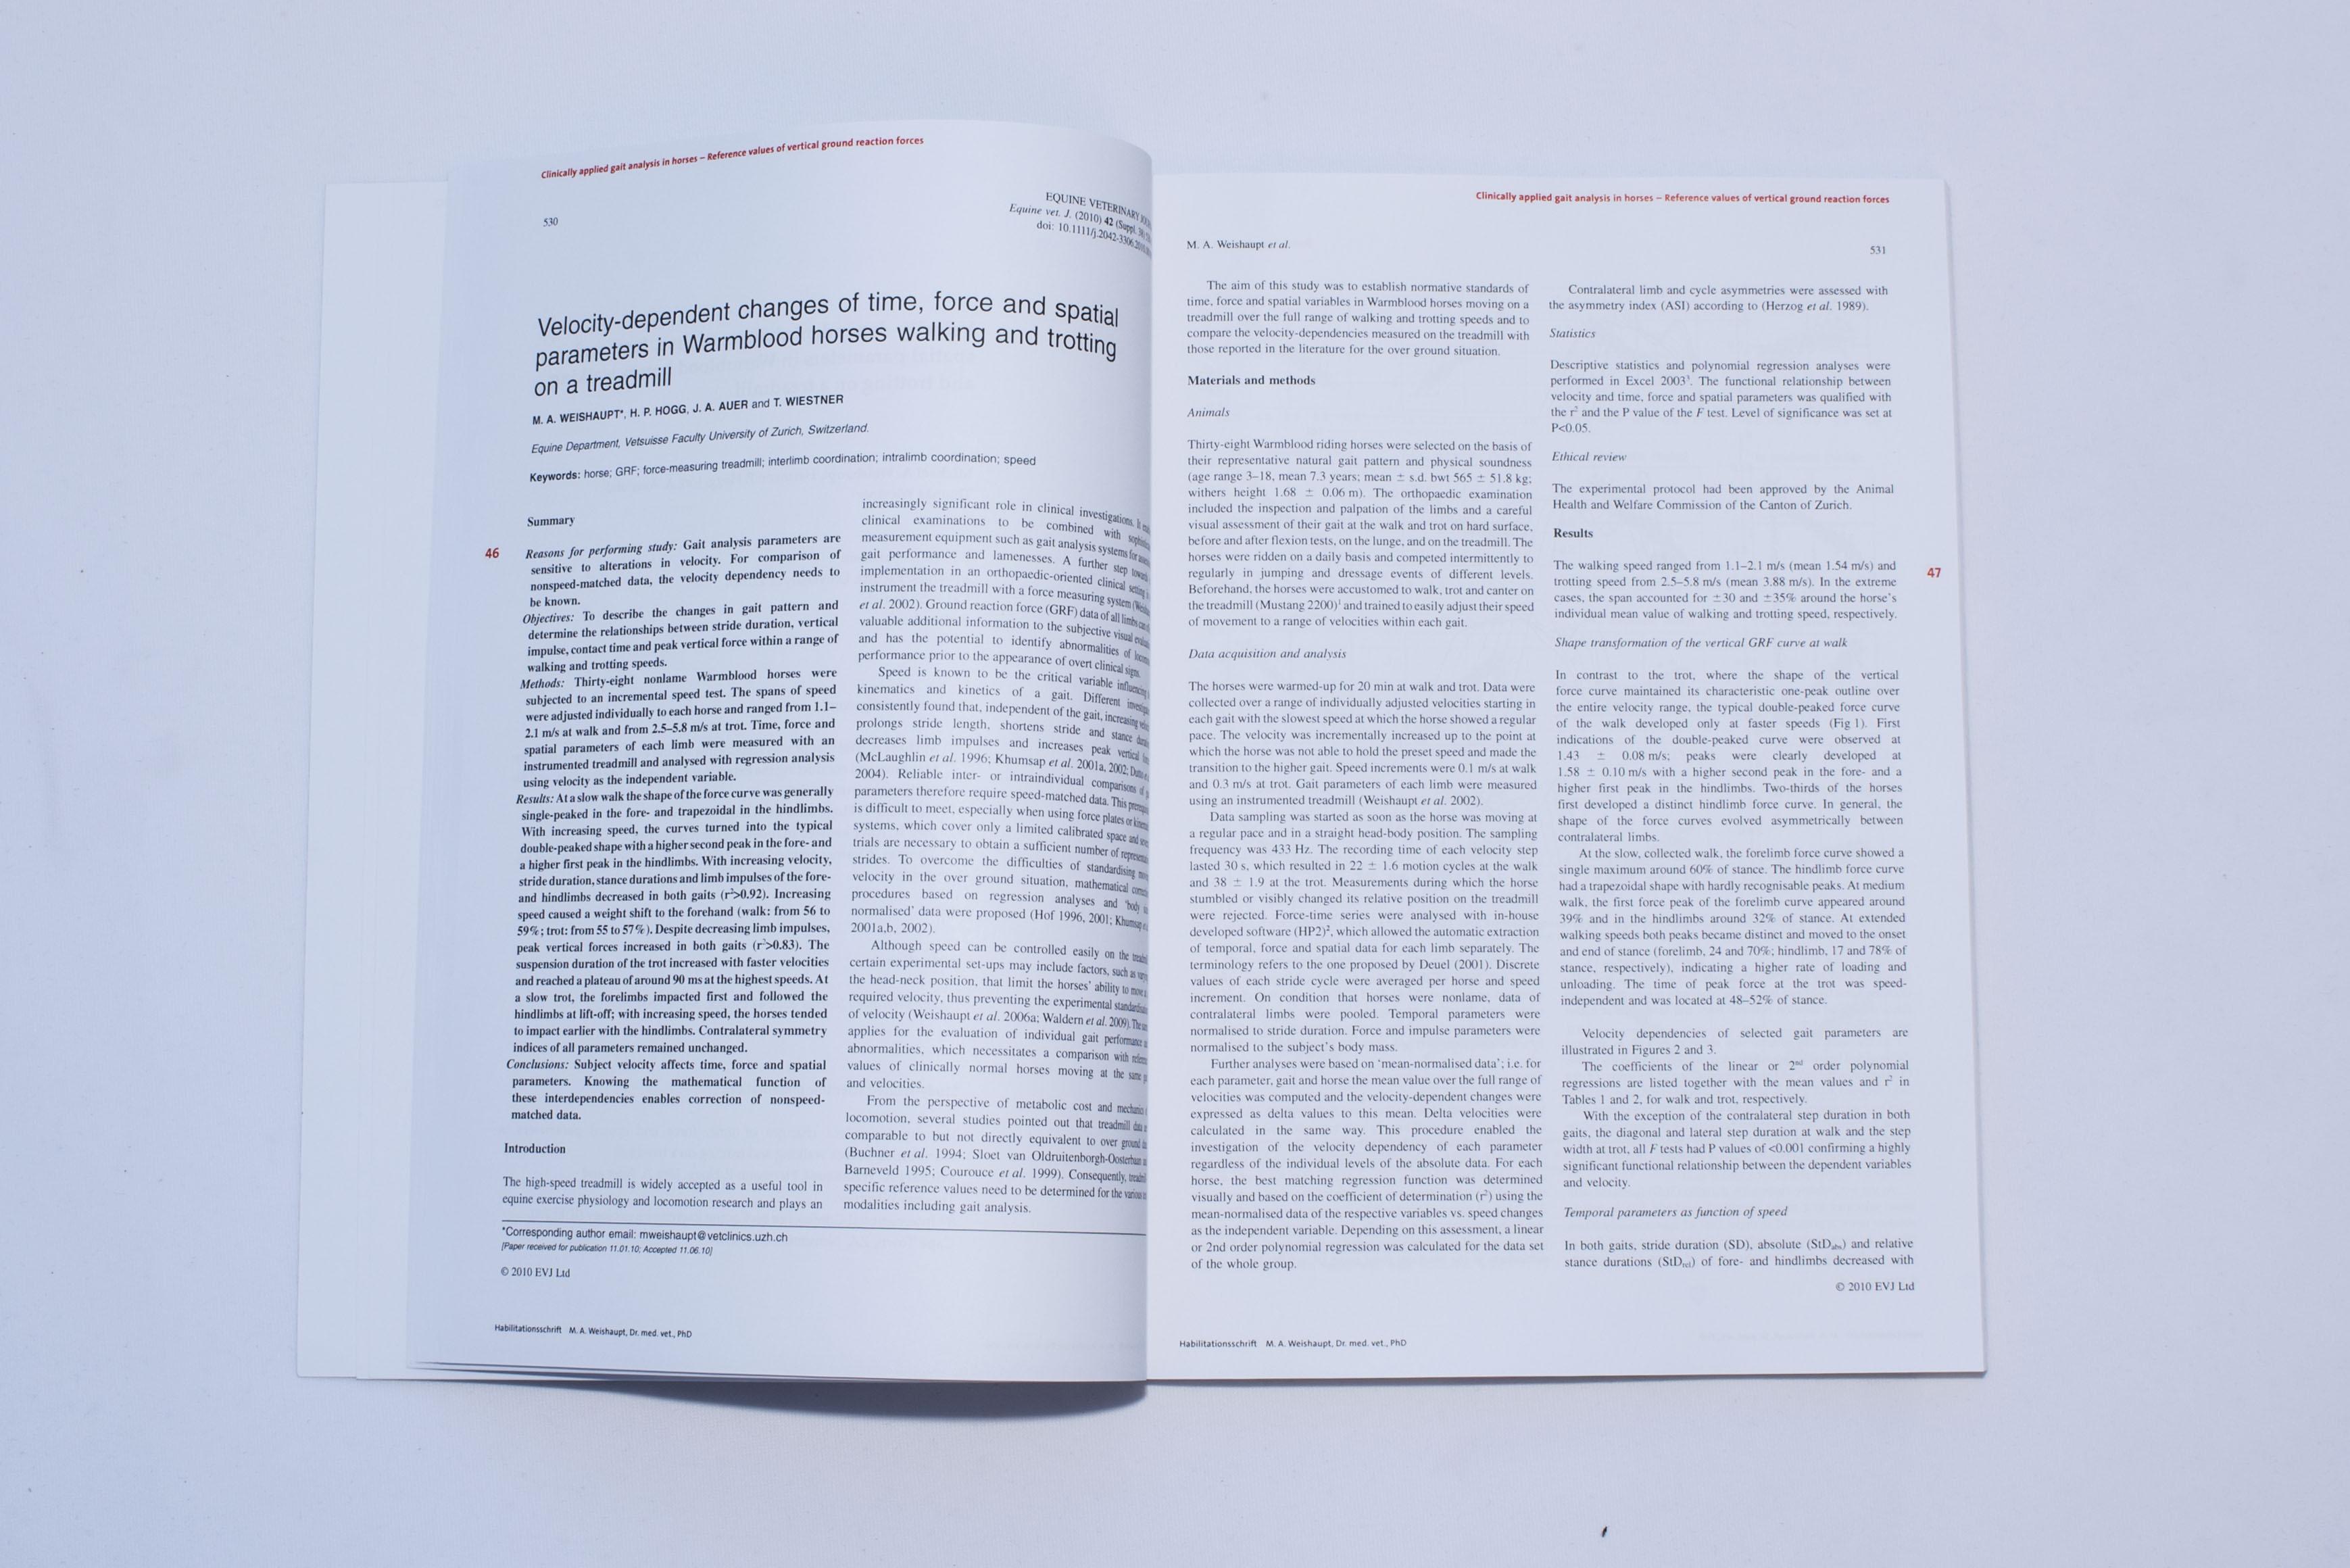 Mehrseitige Dokumente